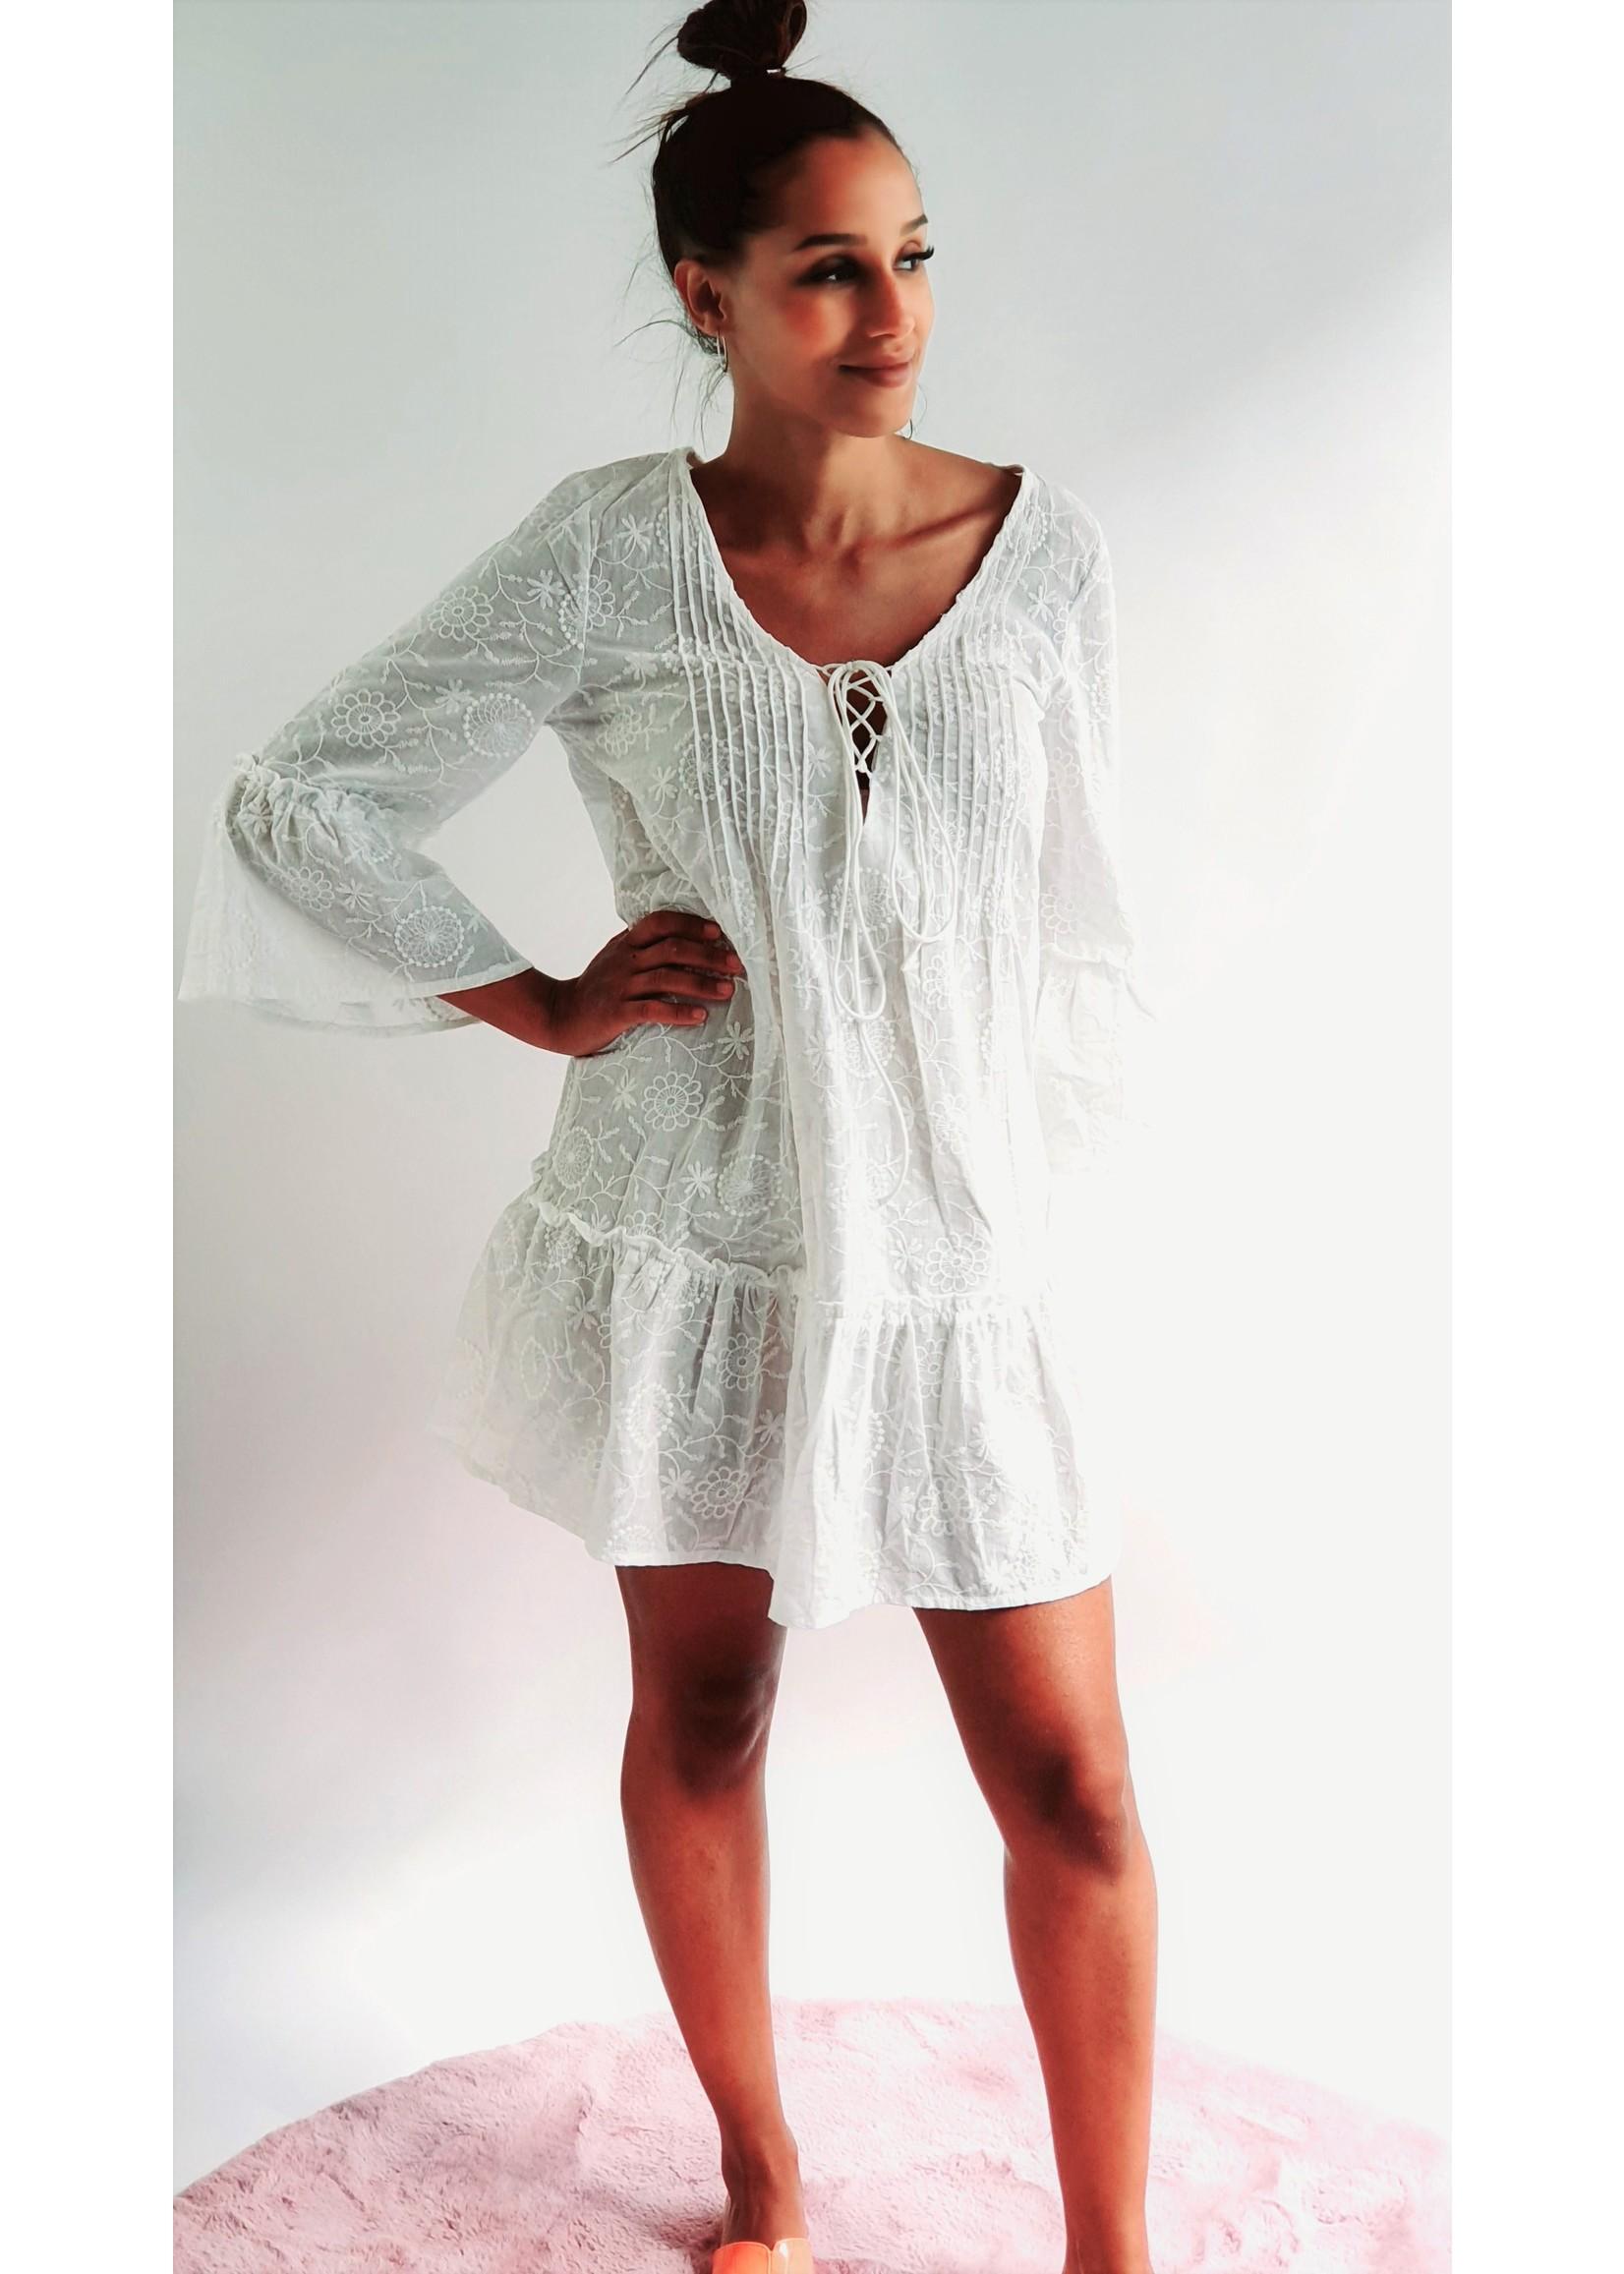 Thé beach dress